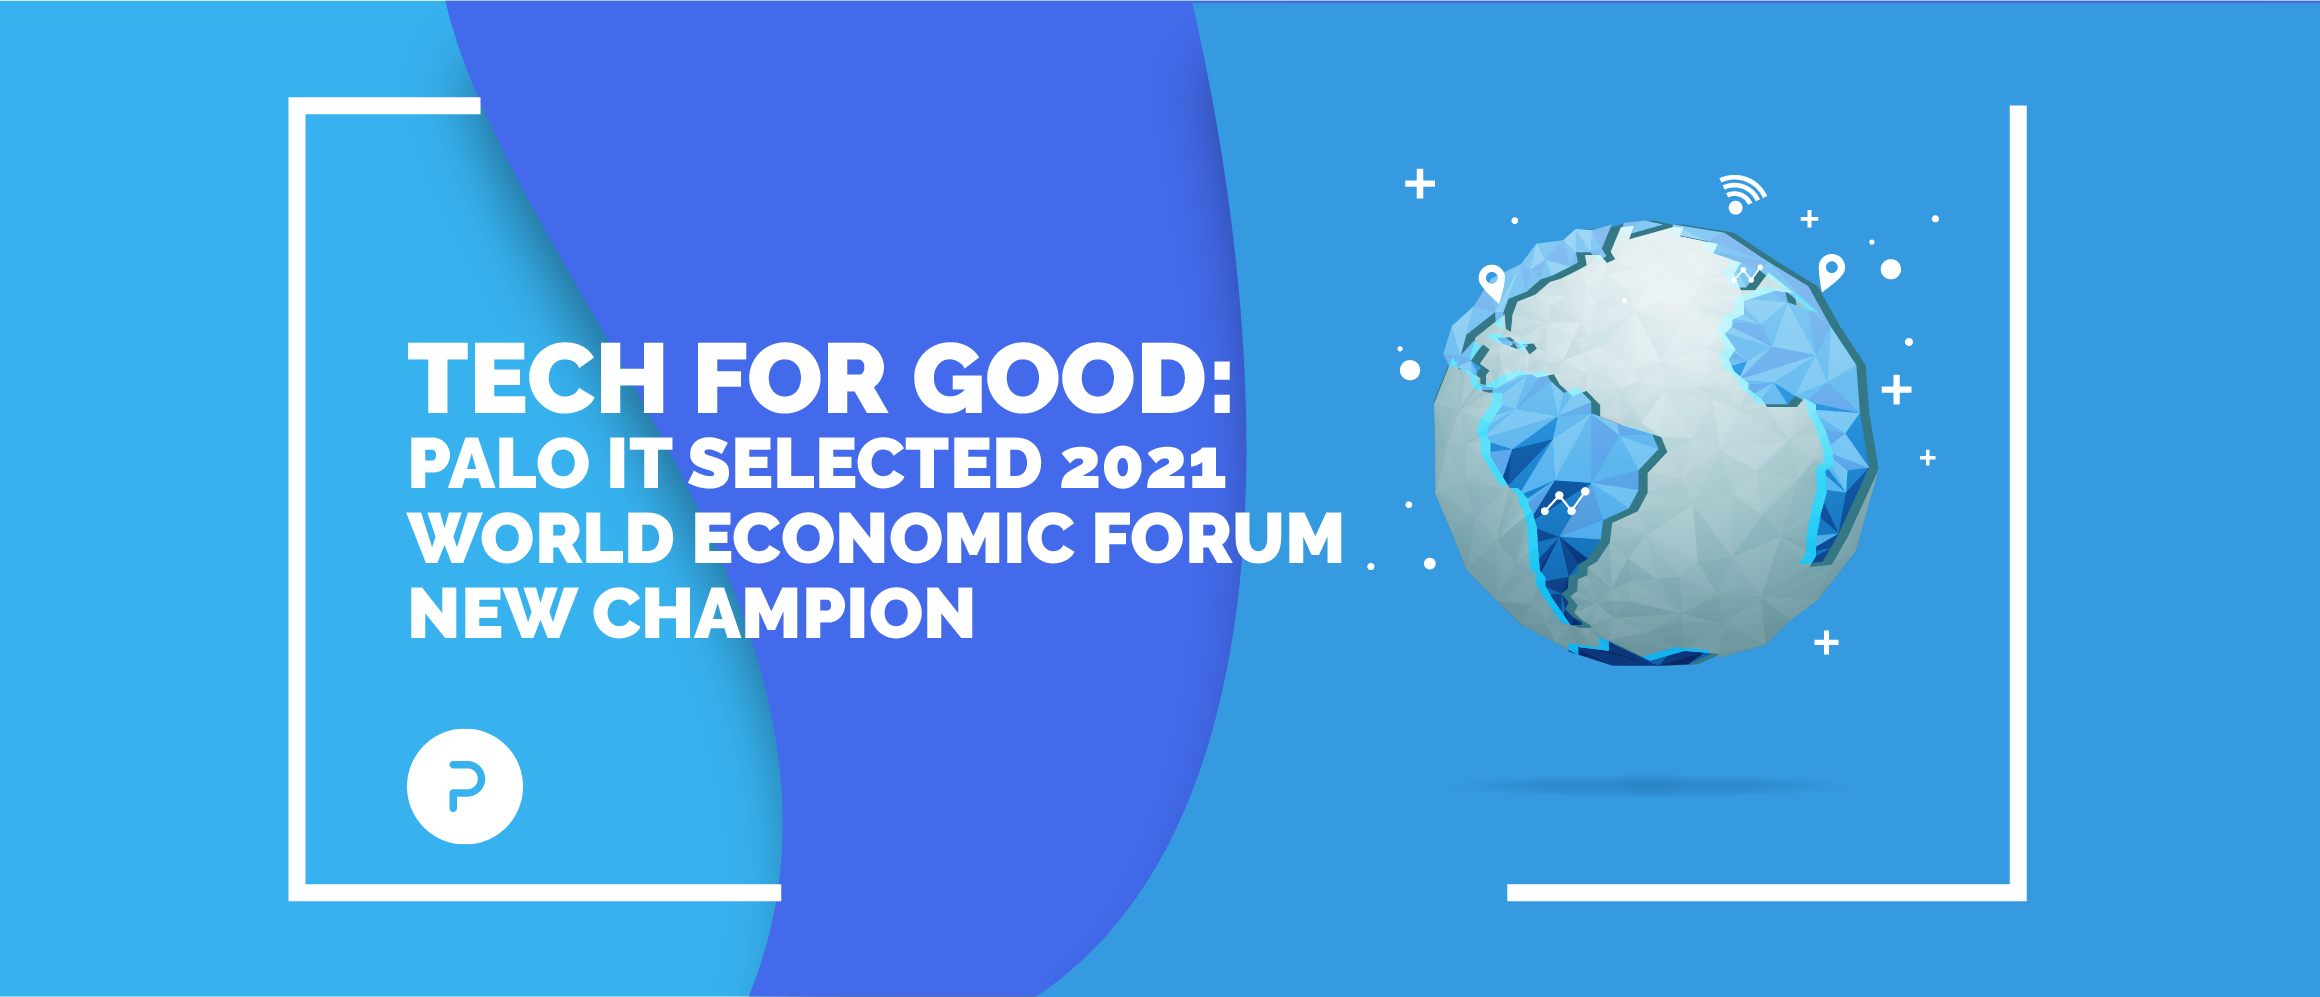 PALO IT selected 2021 World Economic Forum New Champion